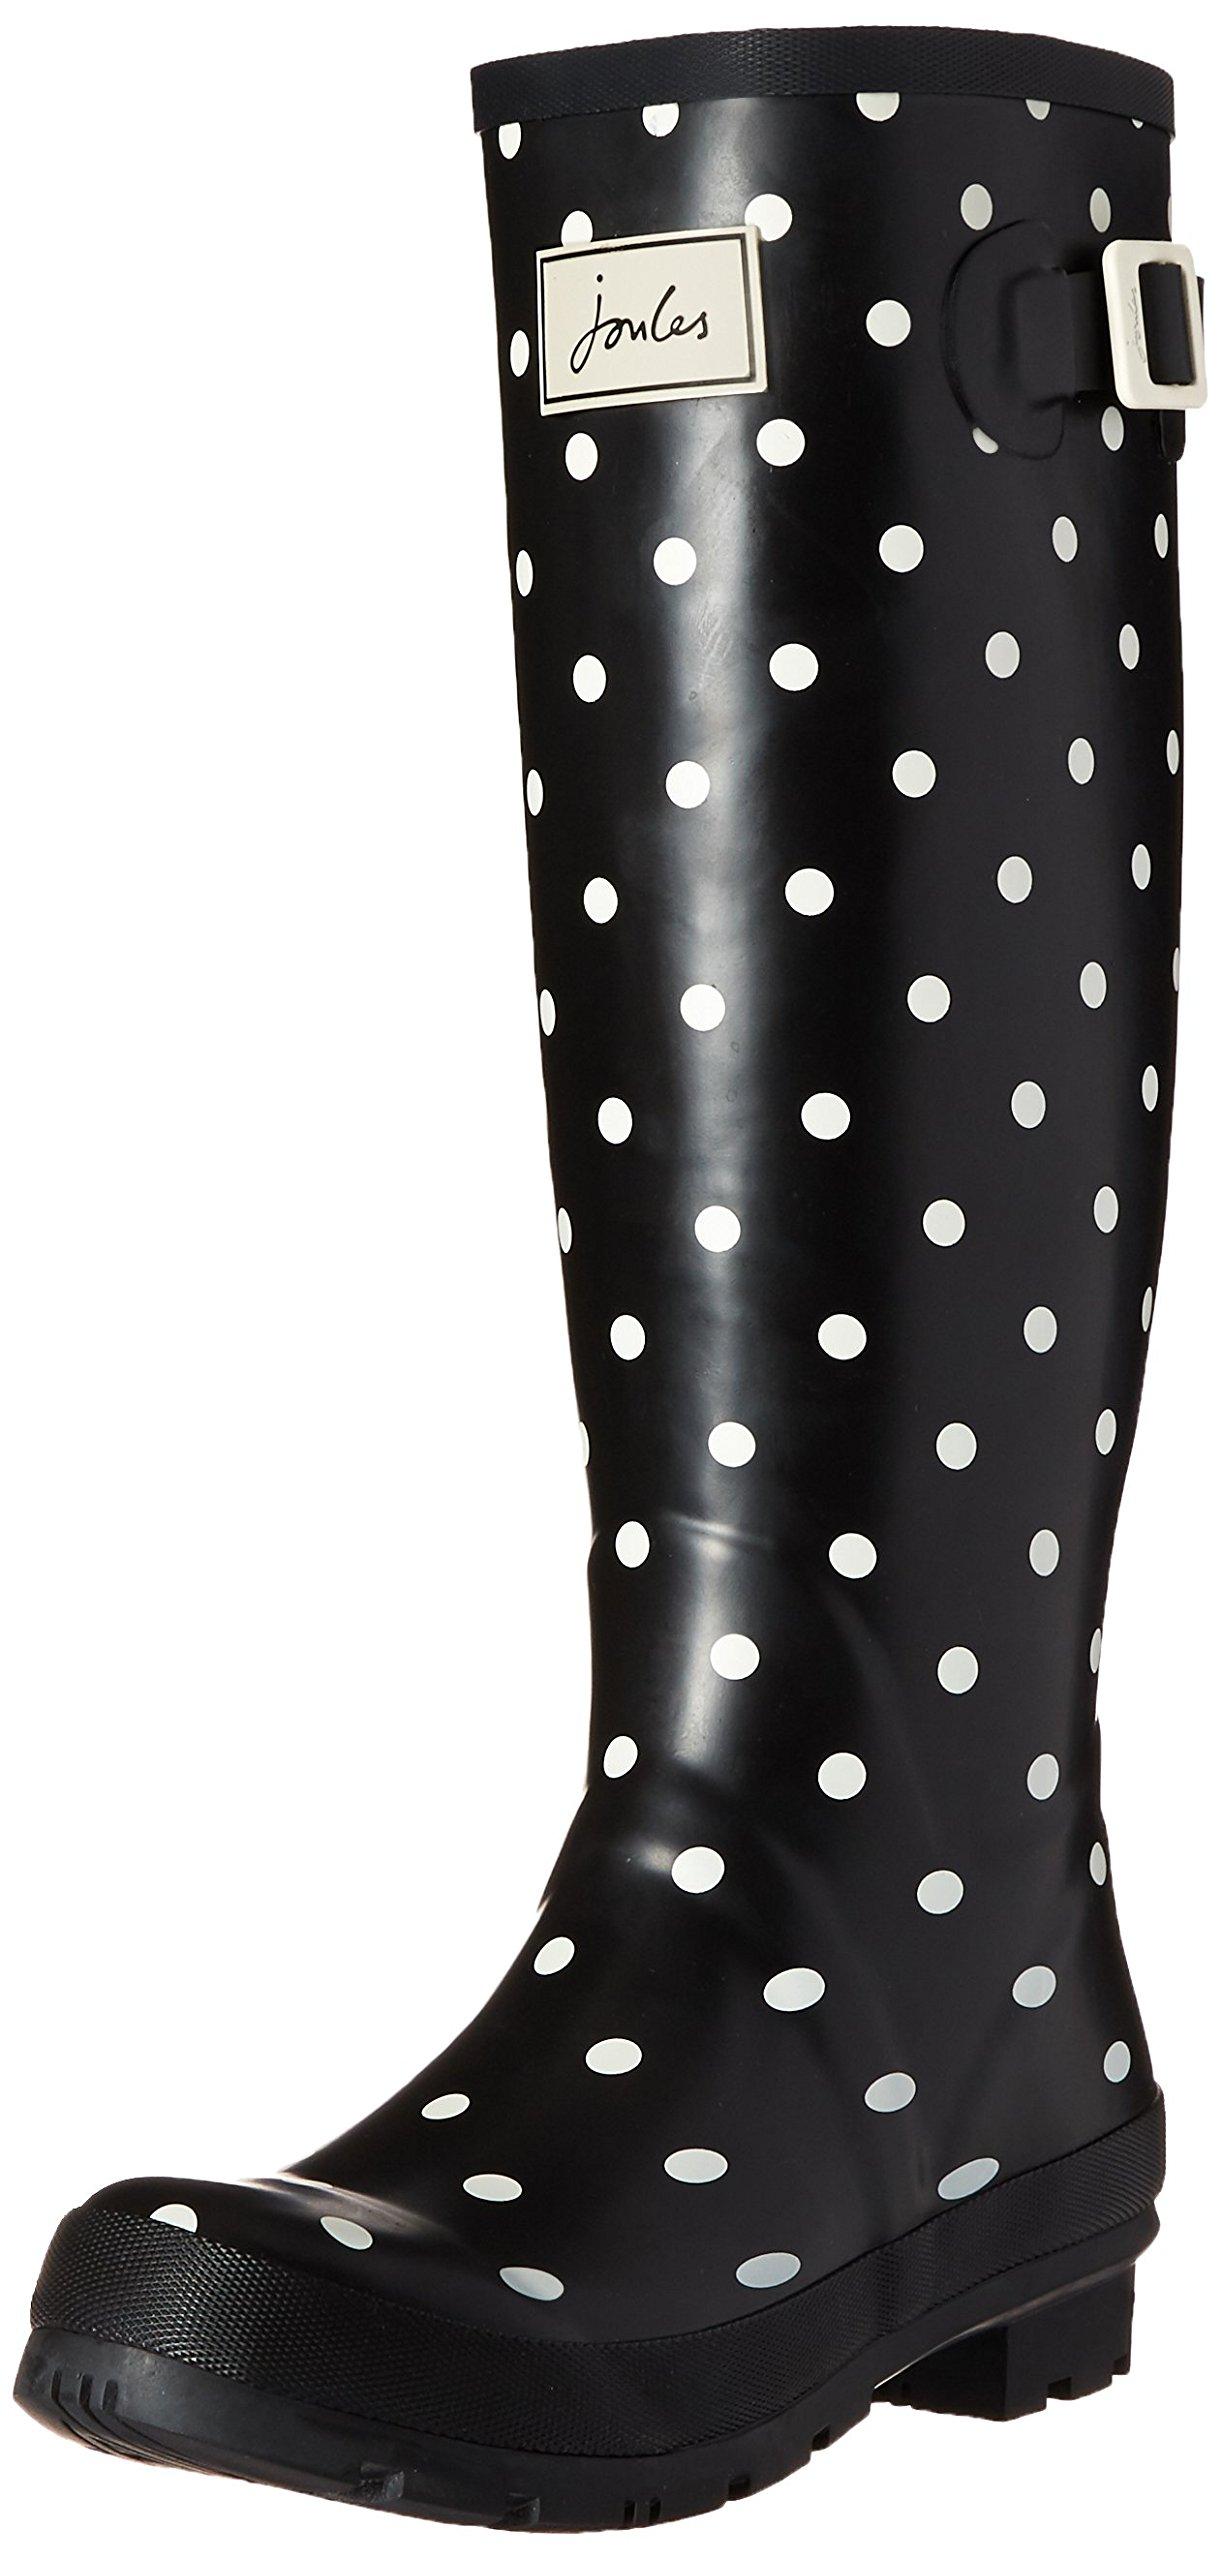 Joules Women's Wellyprint Rain Boot, Cream Spot White, 8 M US